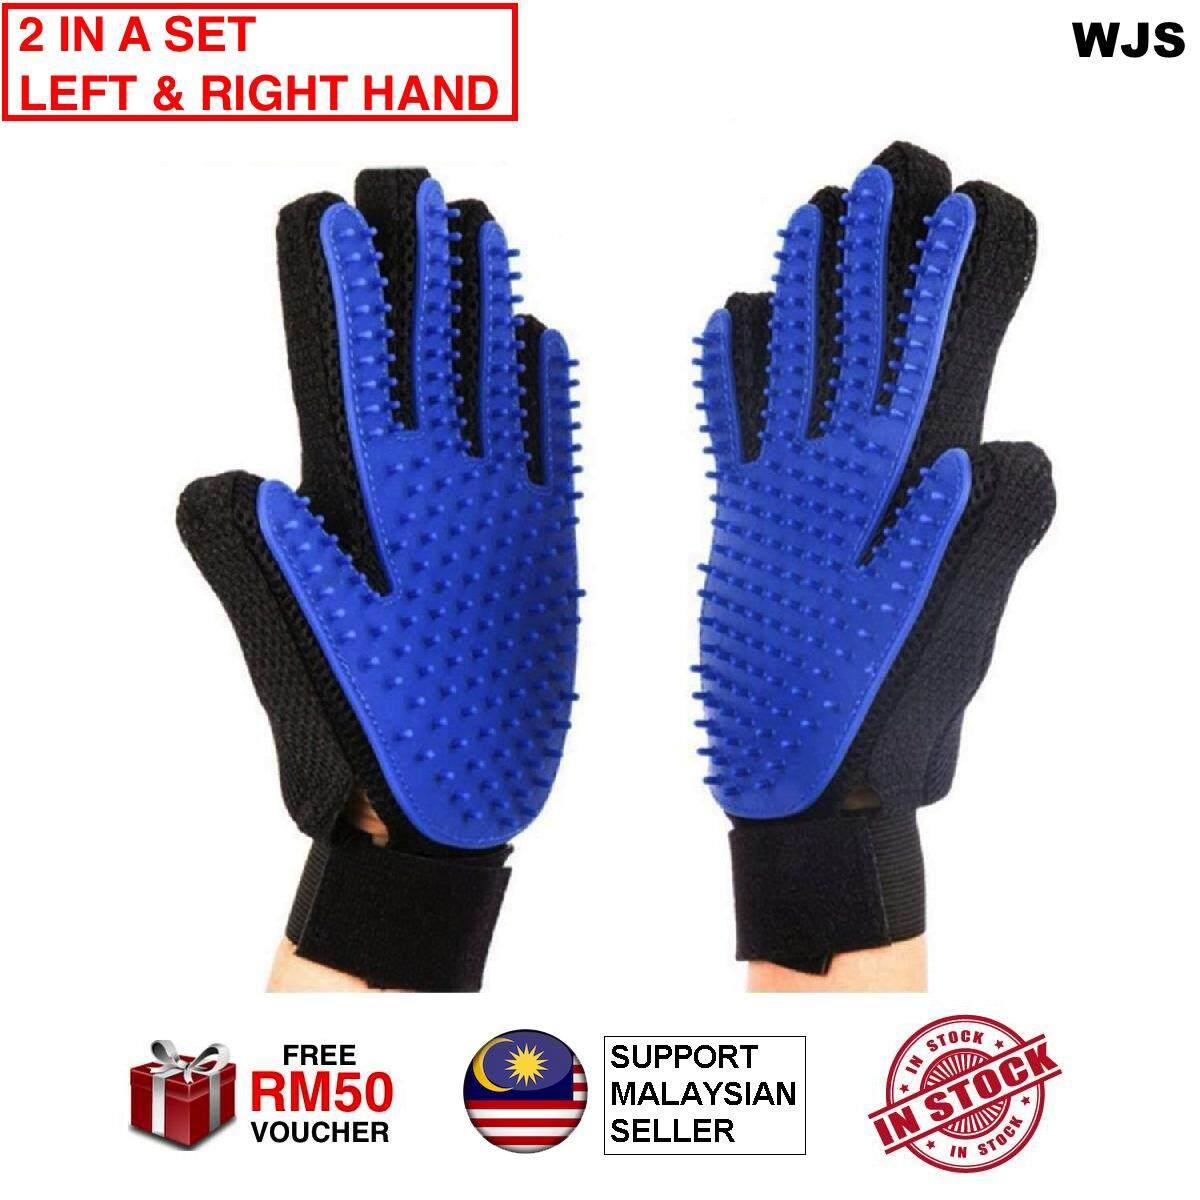 (2 IN A SET - LEFT & RIGHT HAND) WJS True Touch Pet Glove Dog Glove Cat Glove Grooming Deshedding Hair Remover Fur Penggosok Bulu Kucing - Blue [FREE RM50 VOUCHER]